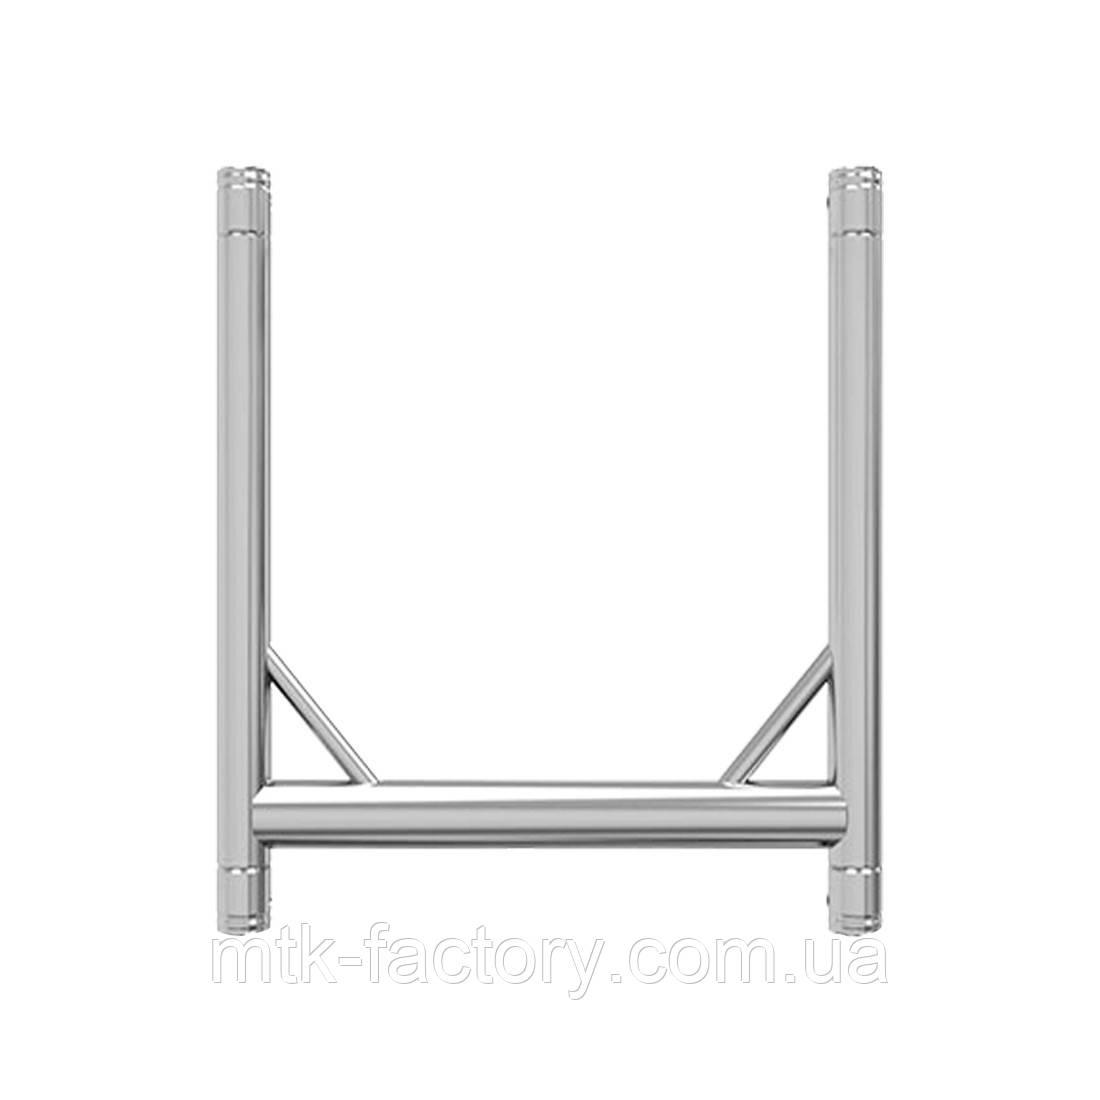 U-frame 100cm